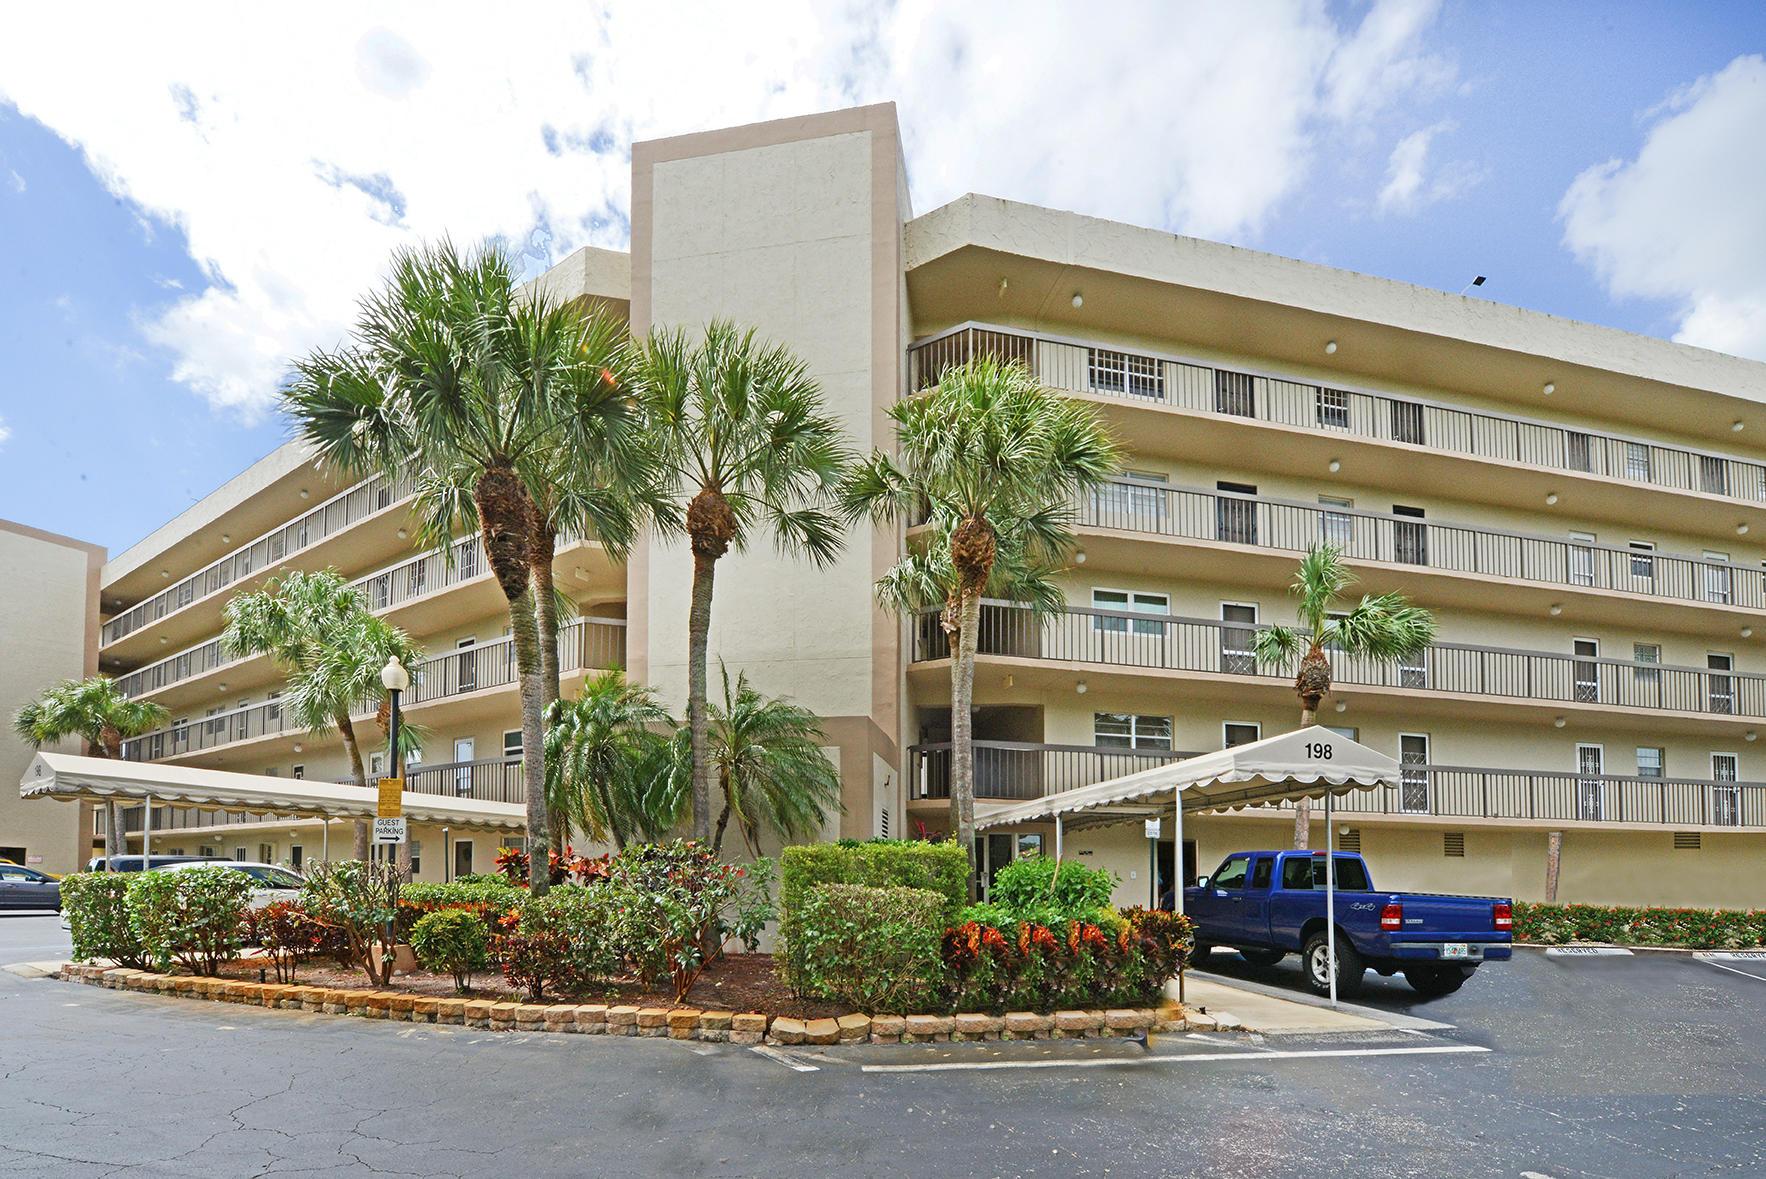 198 NW 67TH Street #401 Boca Raton, FL 33487